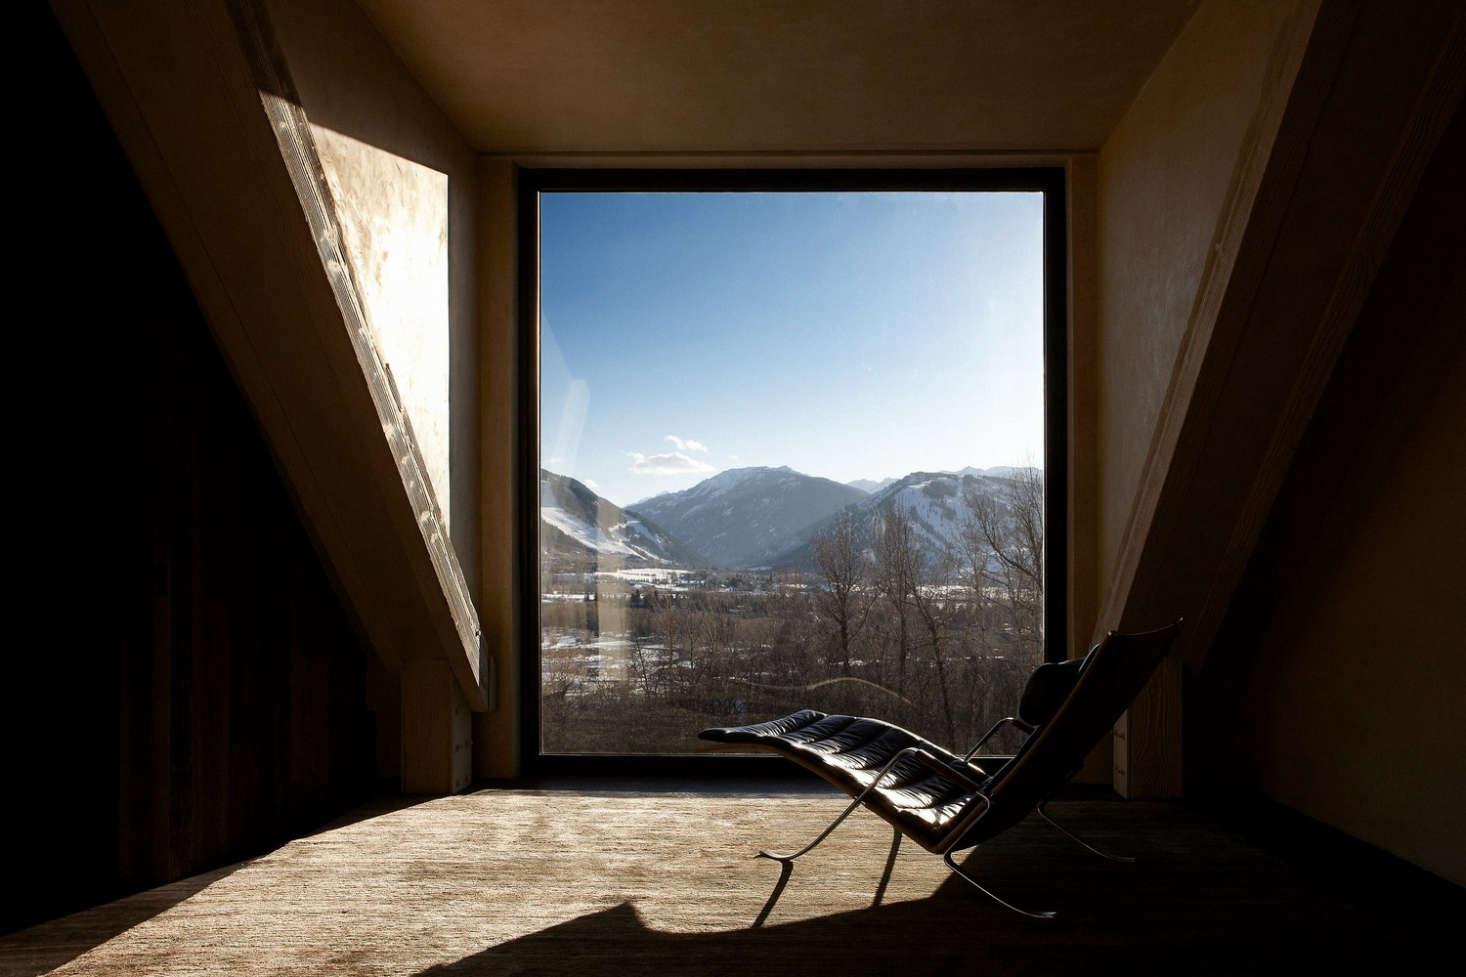 A large window overlooks the mountain range outside.